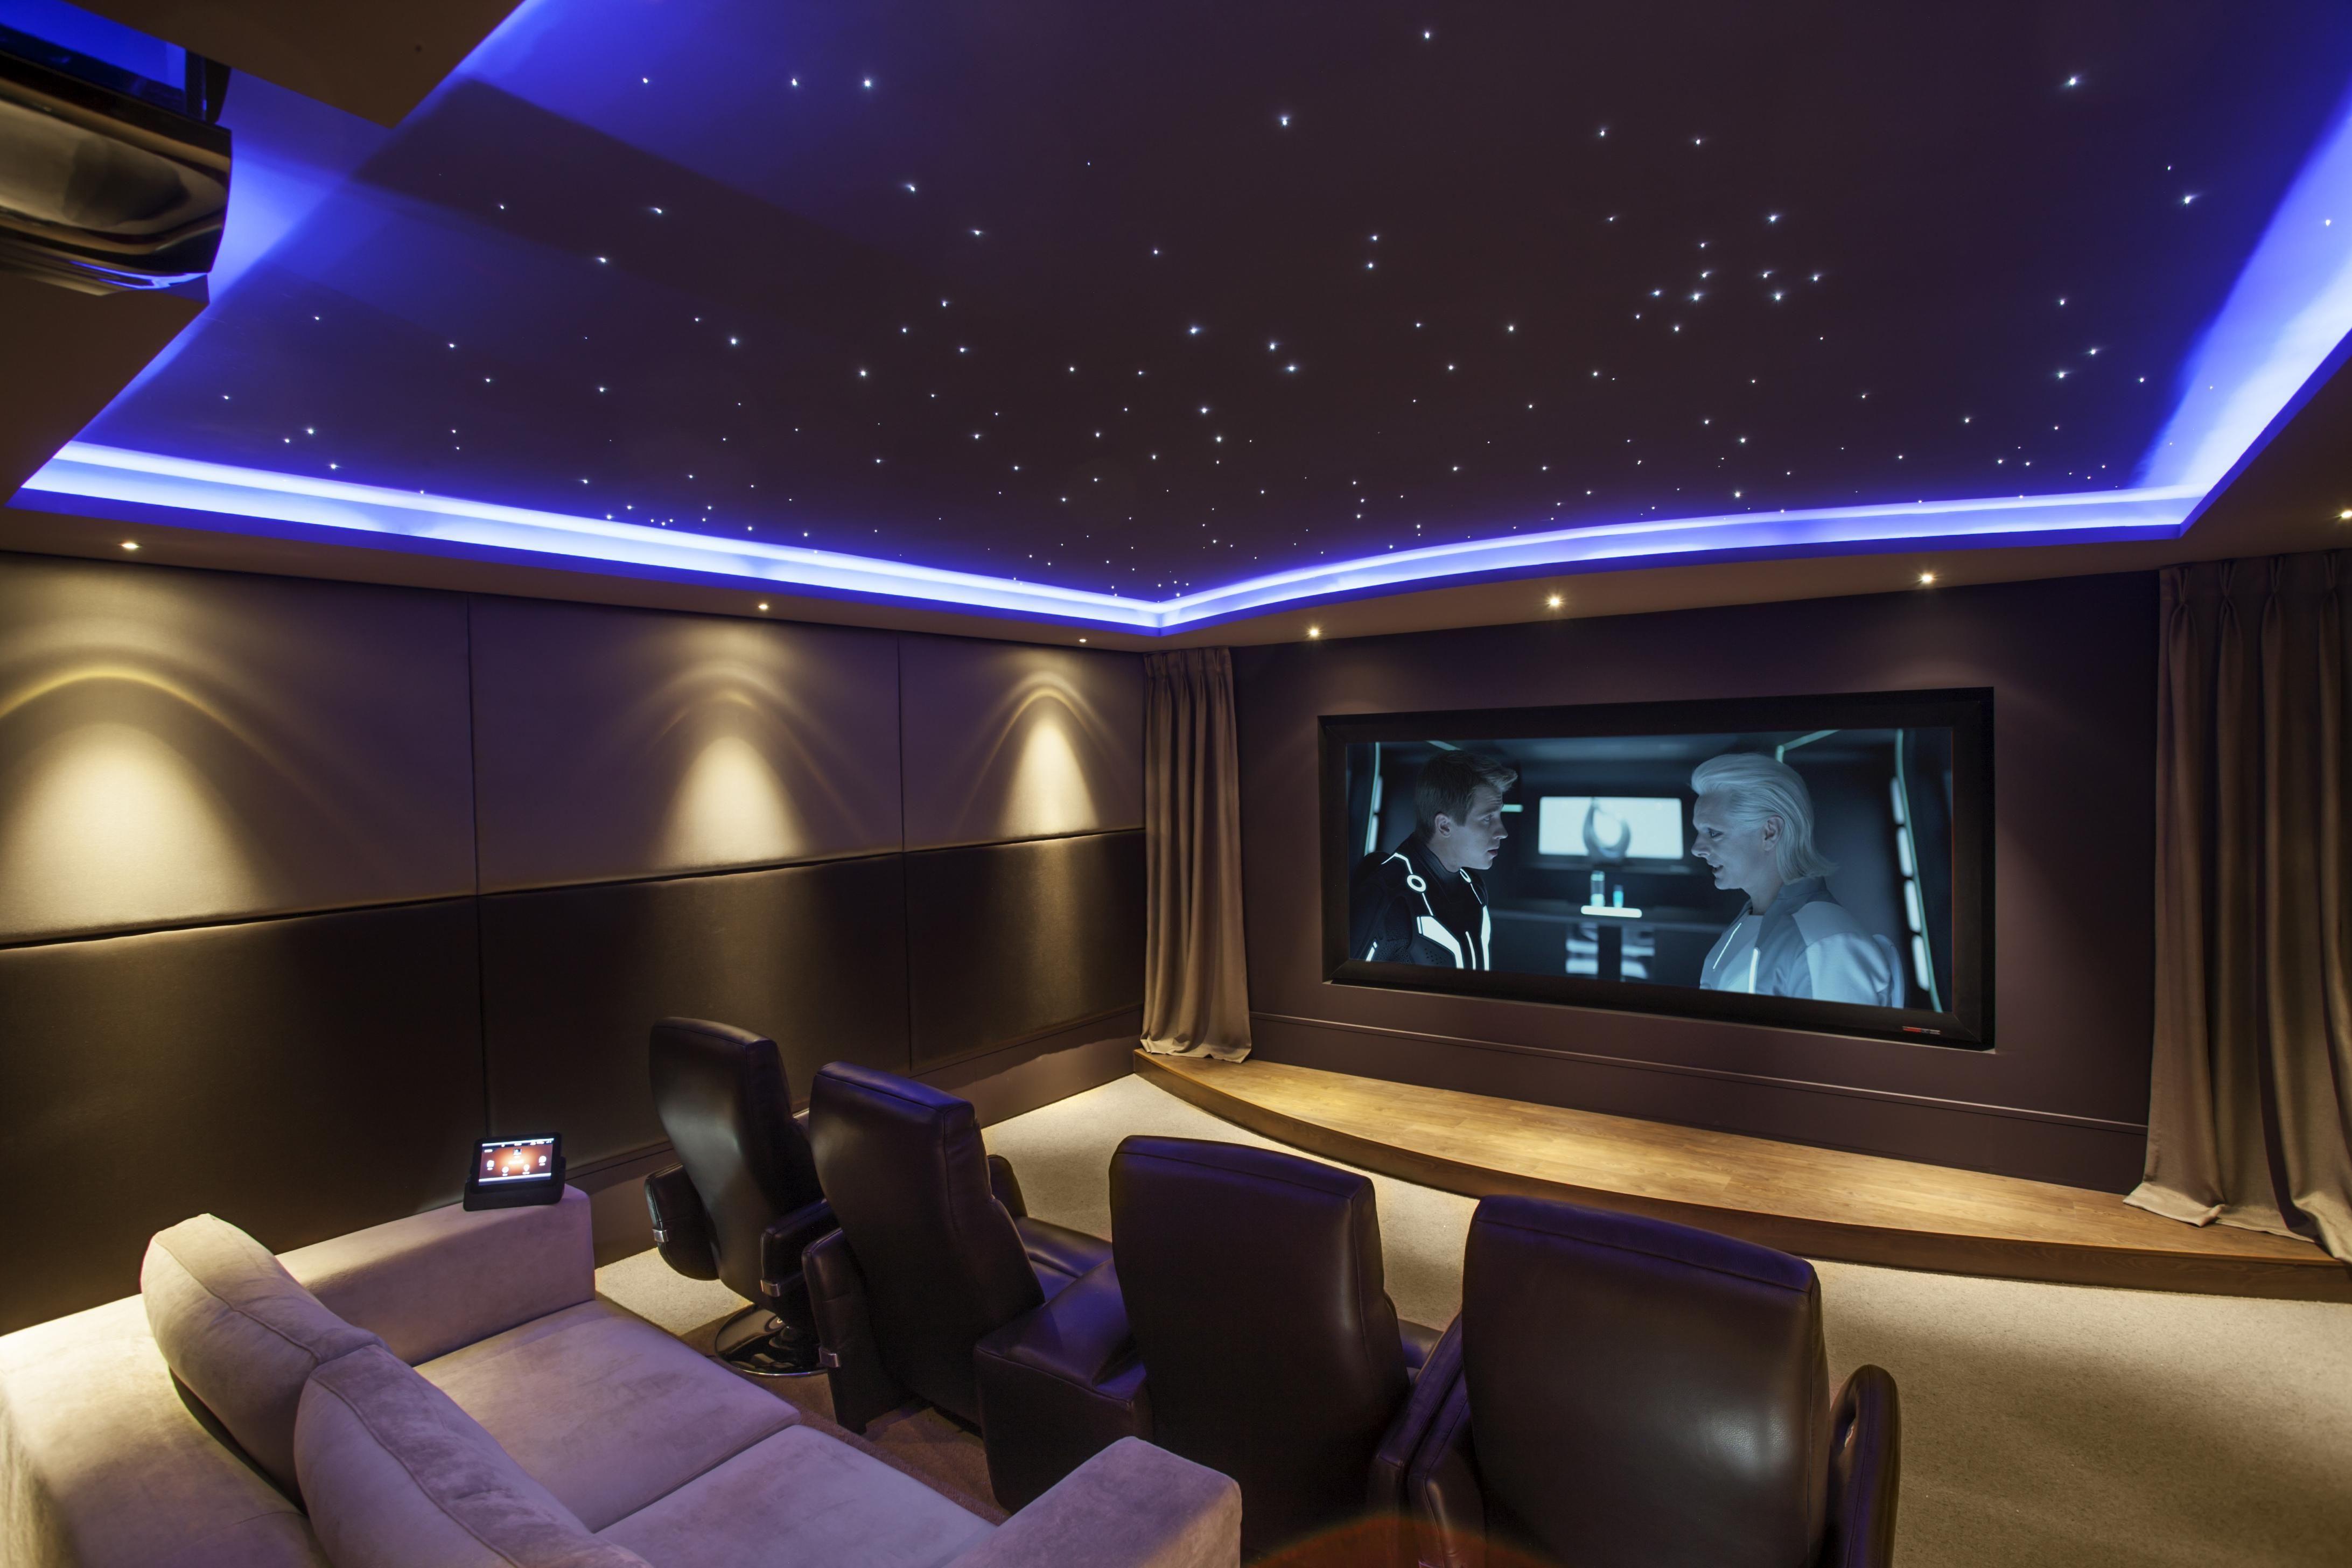 7 Simply Amazing Home Cinema Setups Home Cinema Room Home Theater Room Design Home Theater Lighting